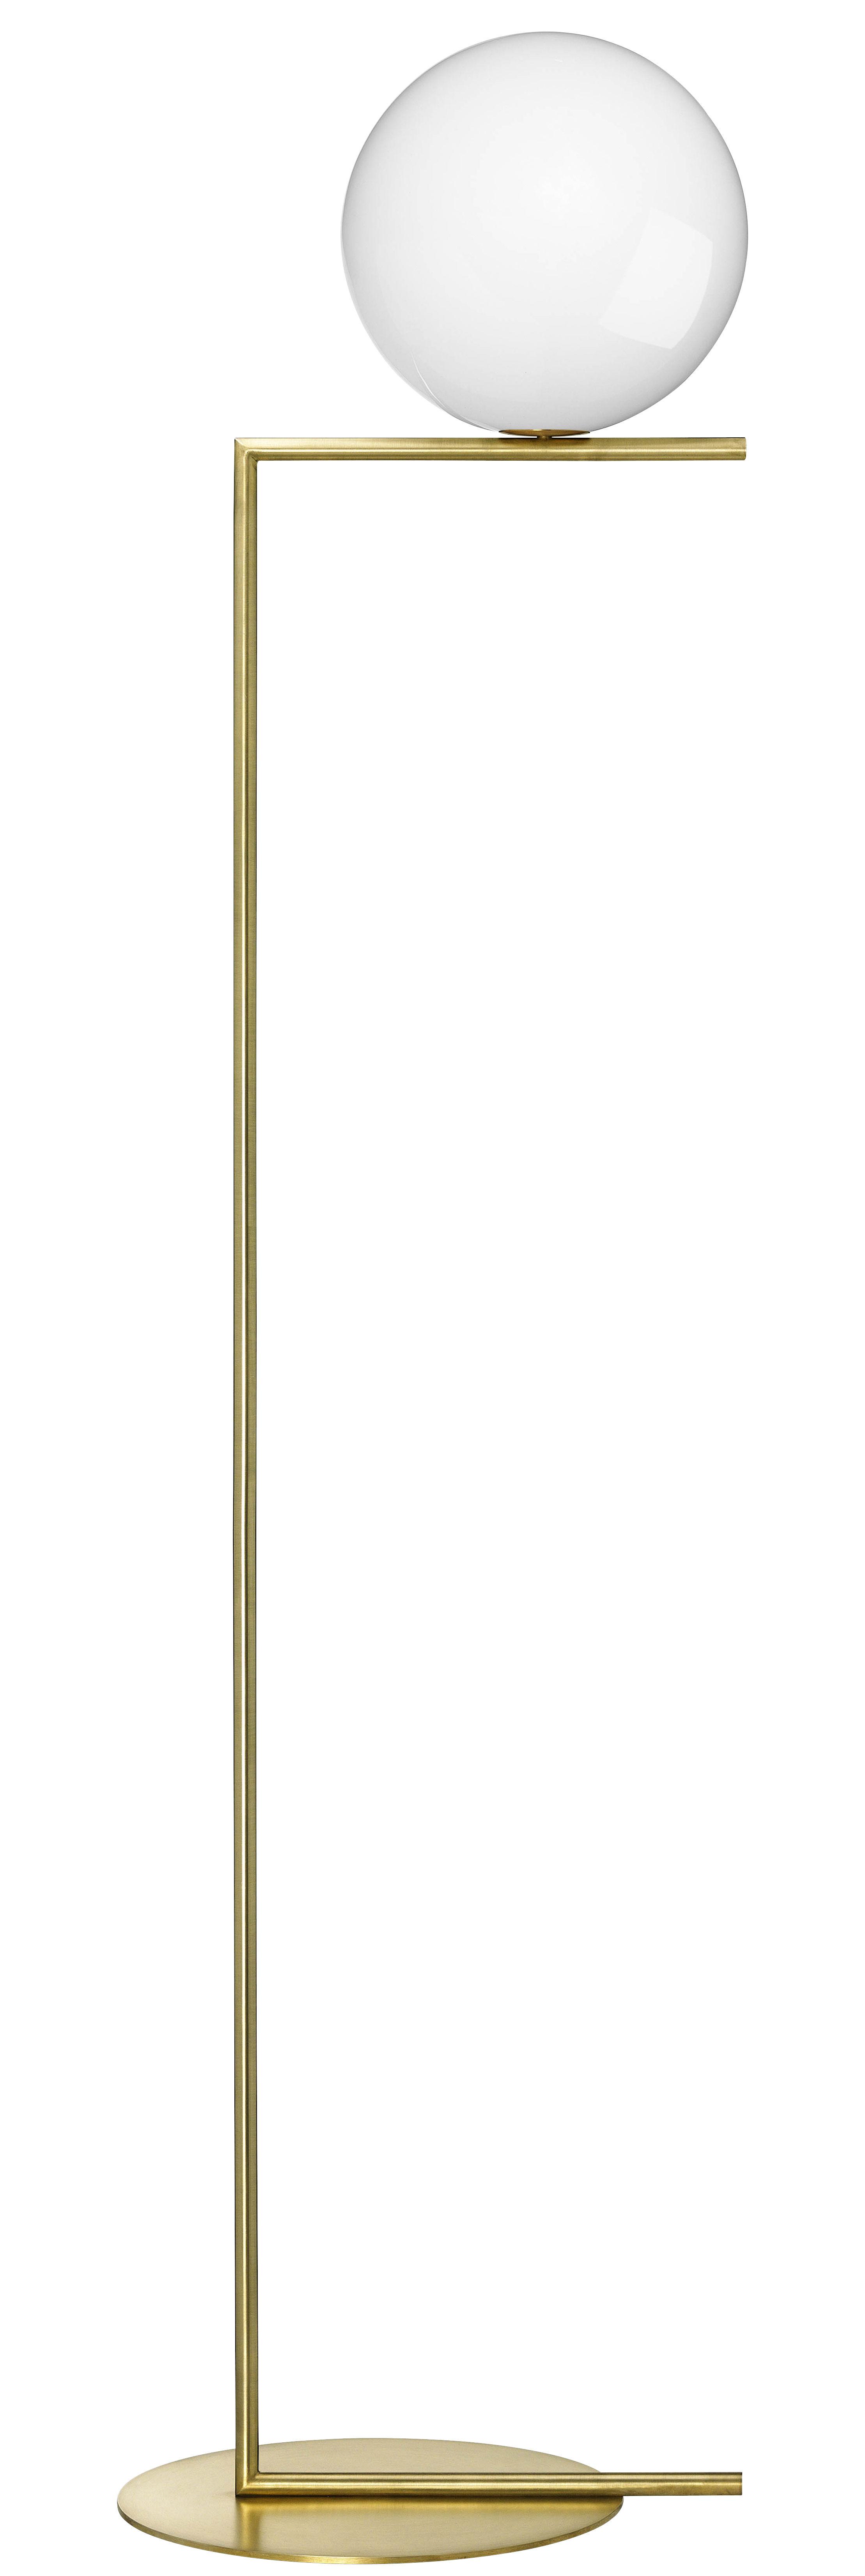 Lighting - Floor lamps - IC F2 Floor lamp by Flos - Brass - Blown glass, Steel